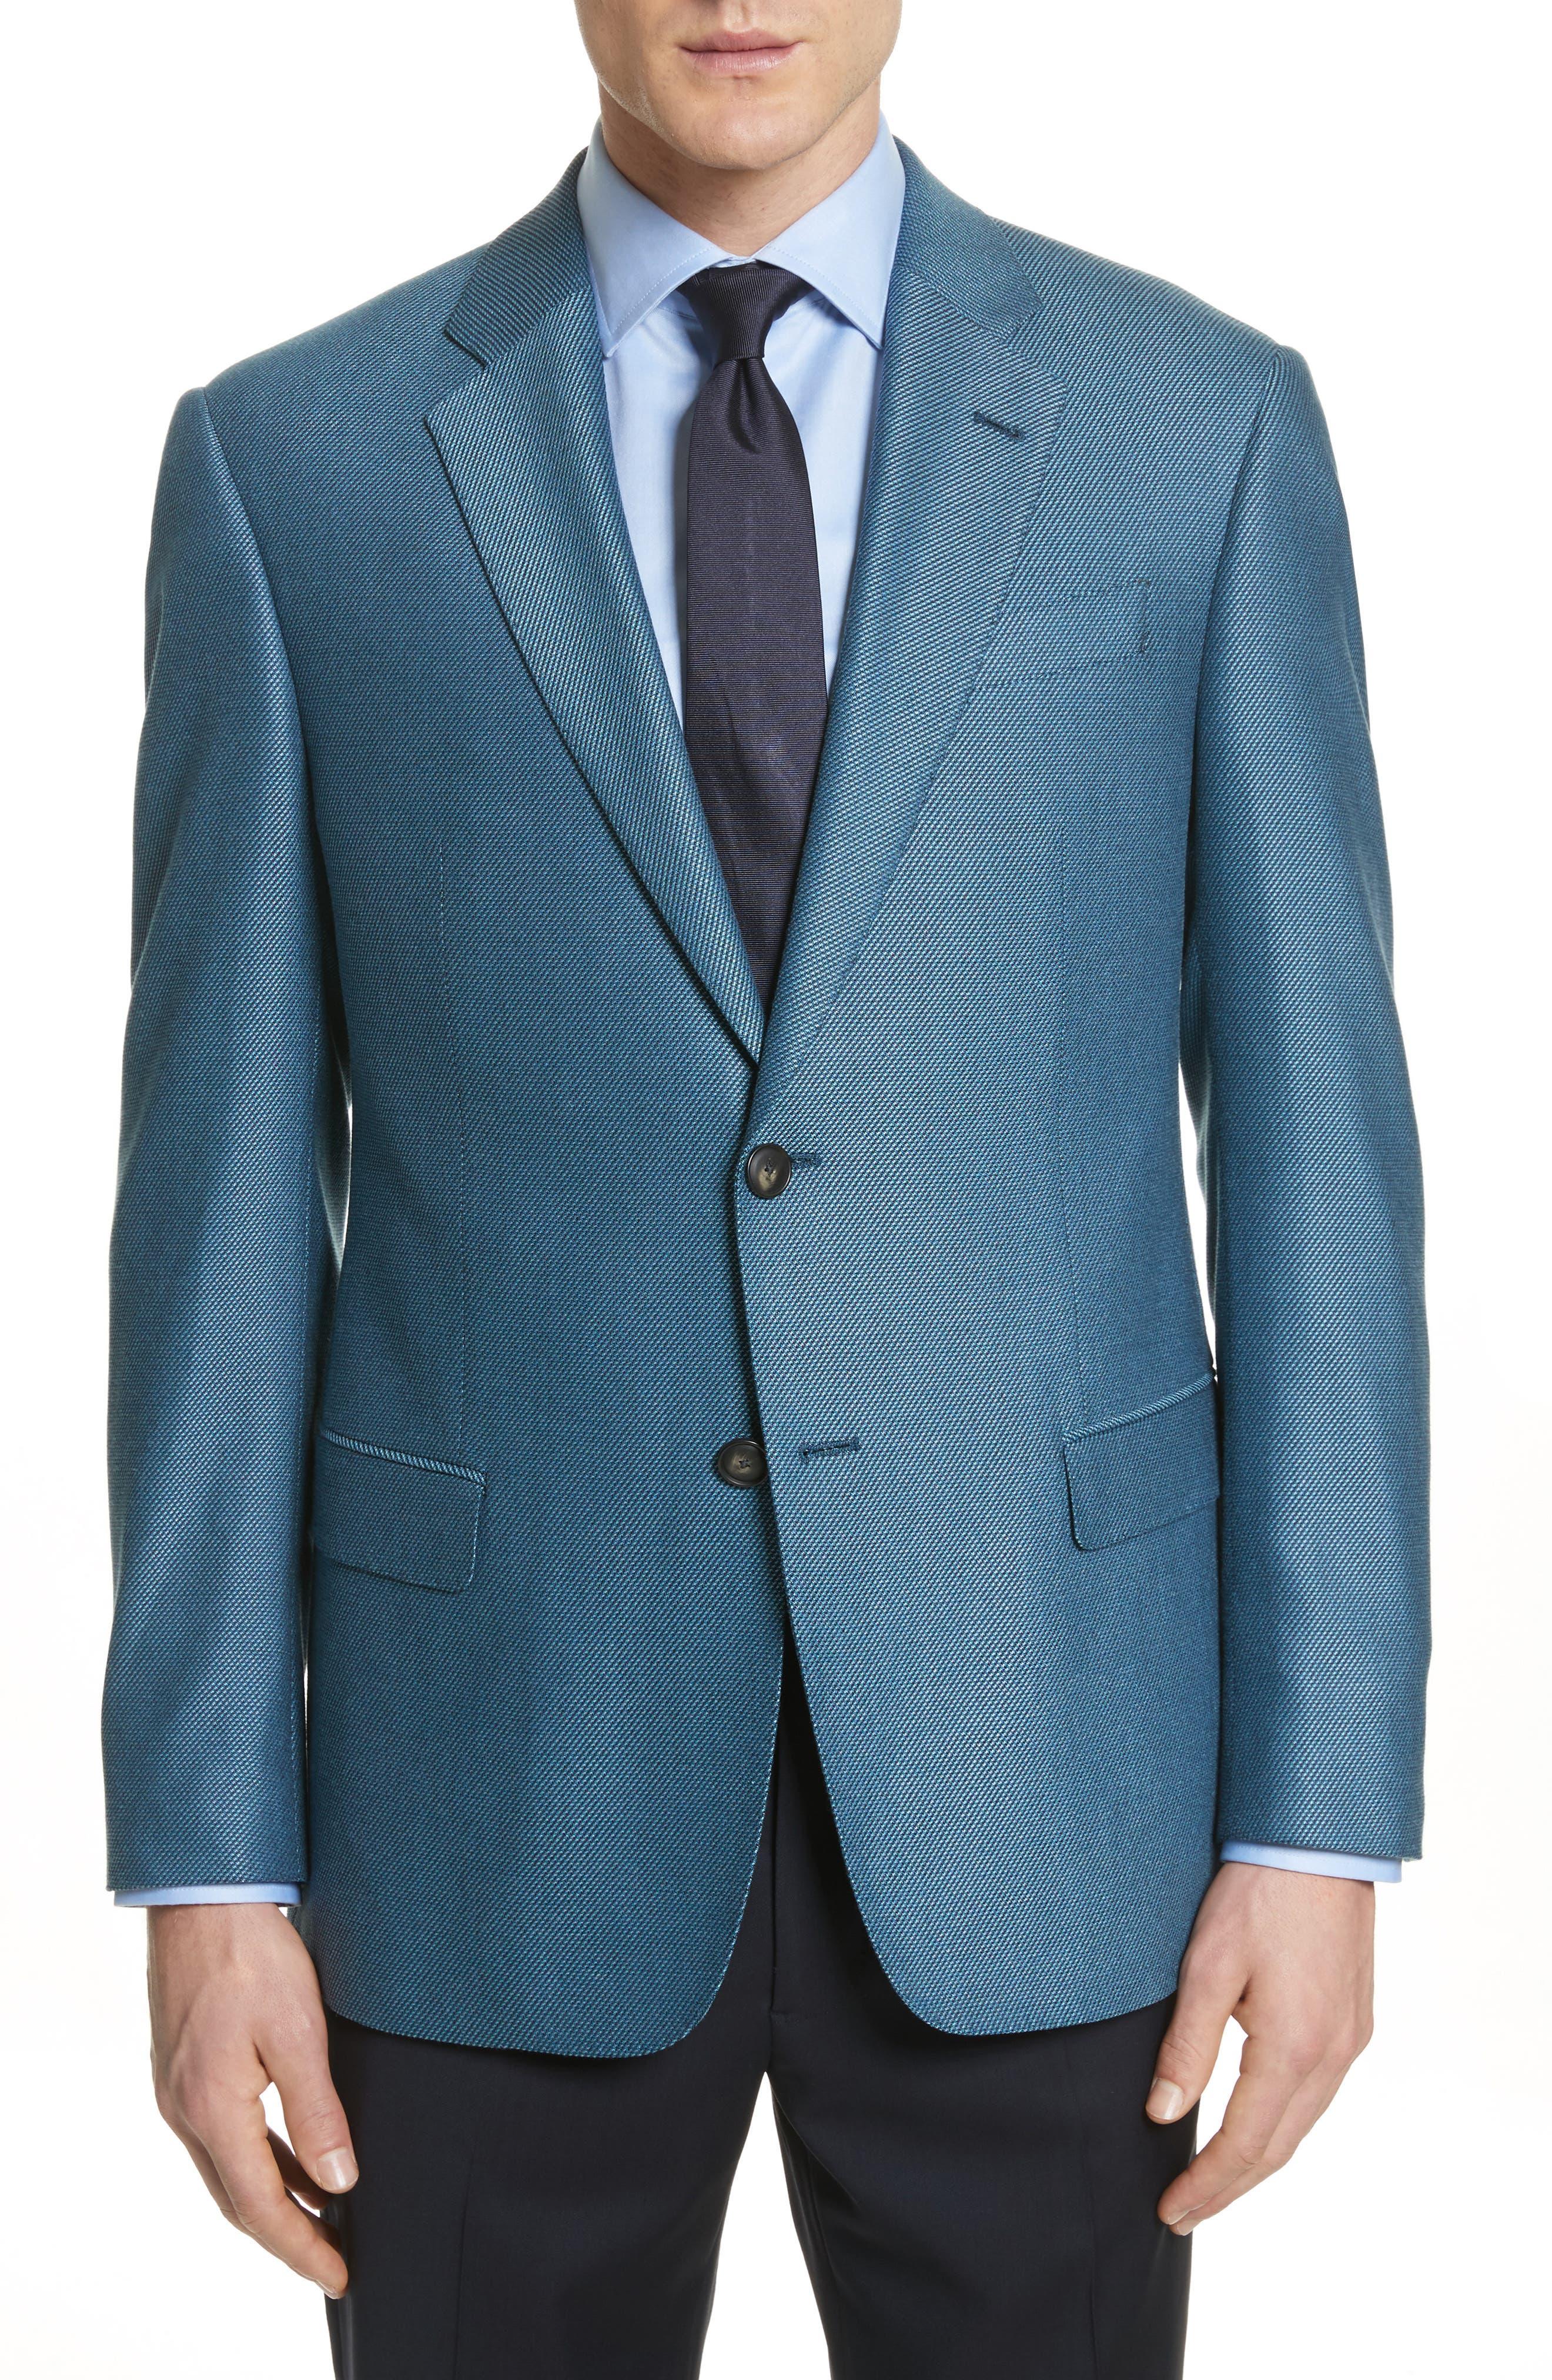 G-Line Trim Fit Blazer,                         Main,                         color, Blue Grey